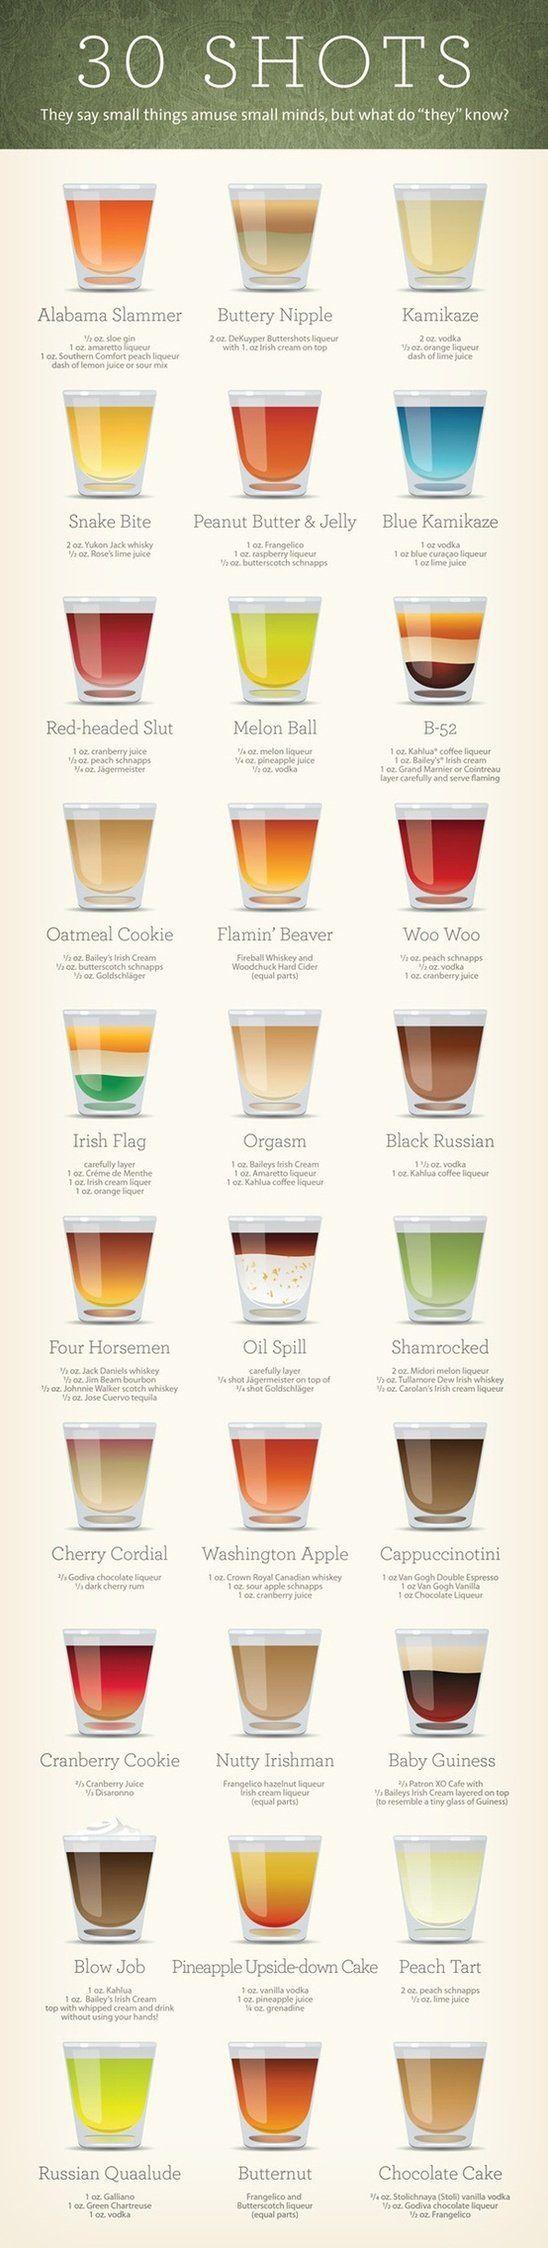 Super cool guide to shot #cocktails & #drinks! - @HauteFrugalista